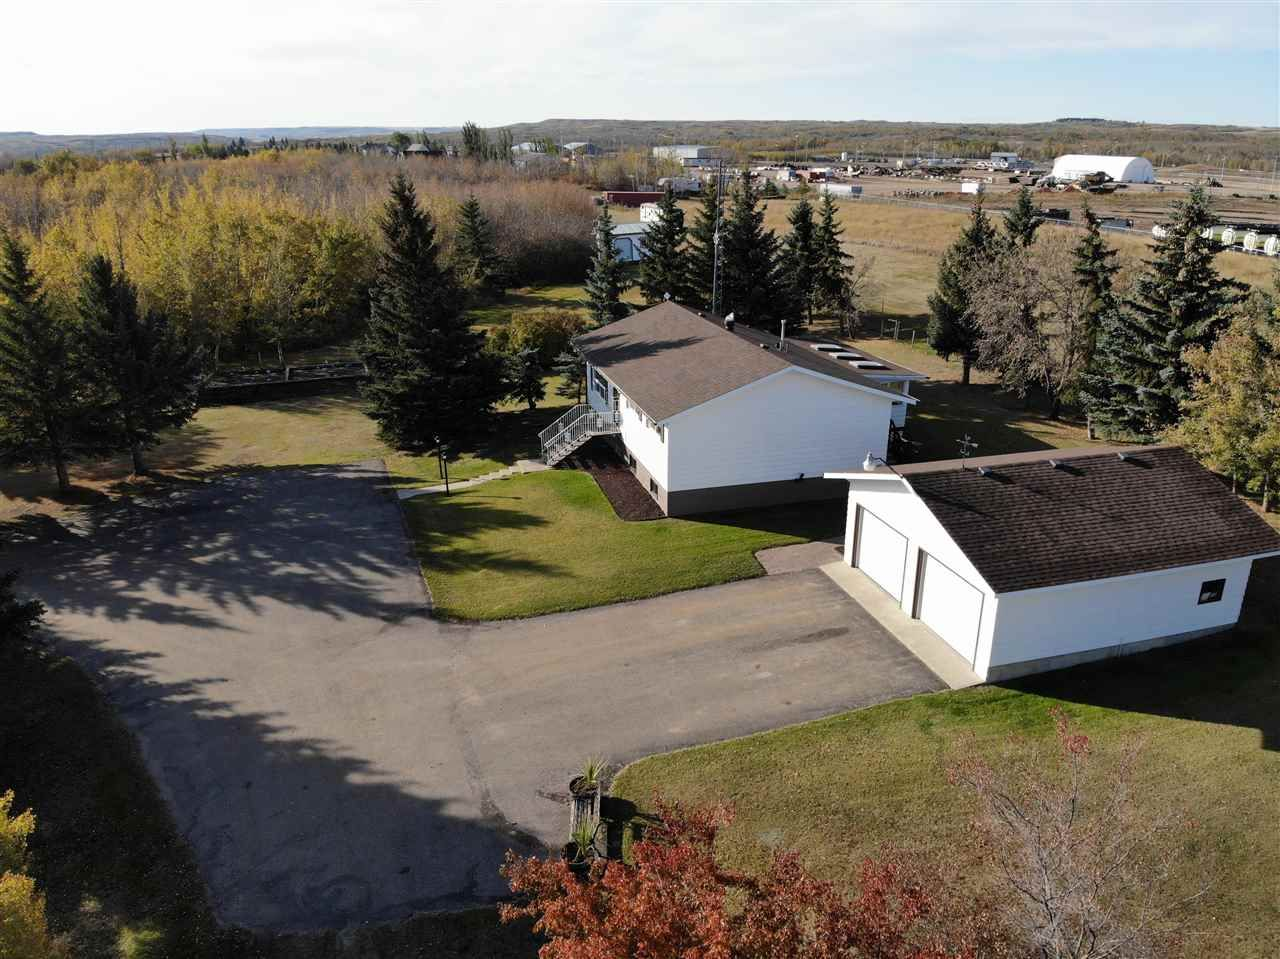 Main Photo: 4426 47 Street: Hardisty House for sale : MLS®# E4210191